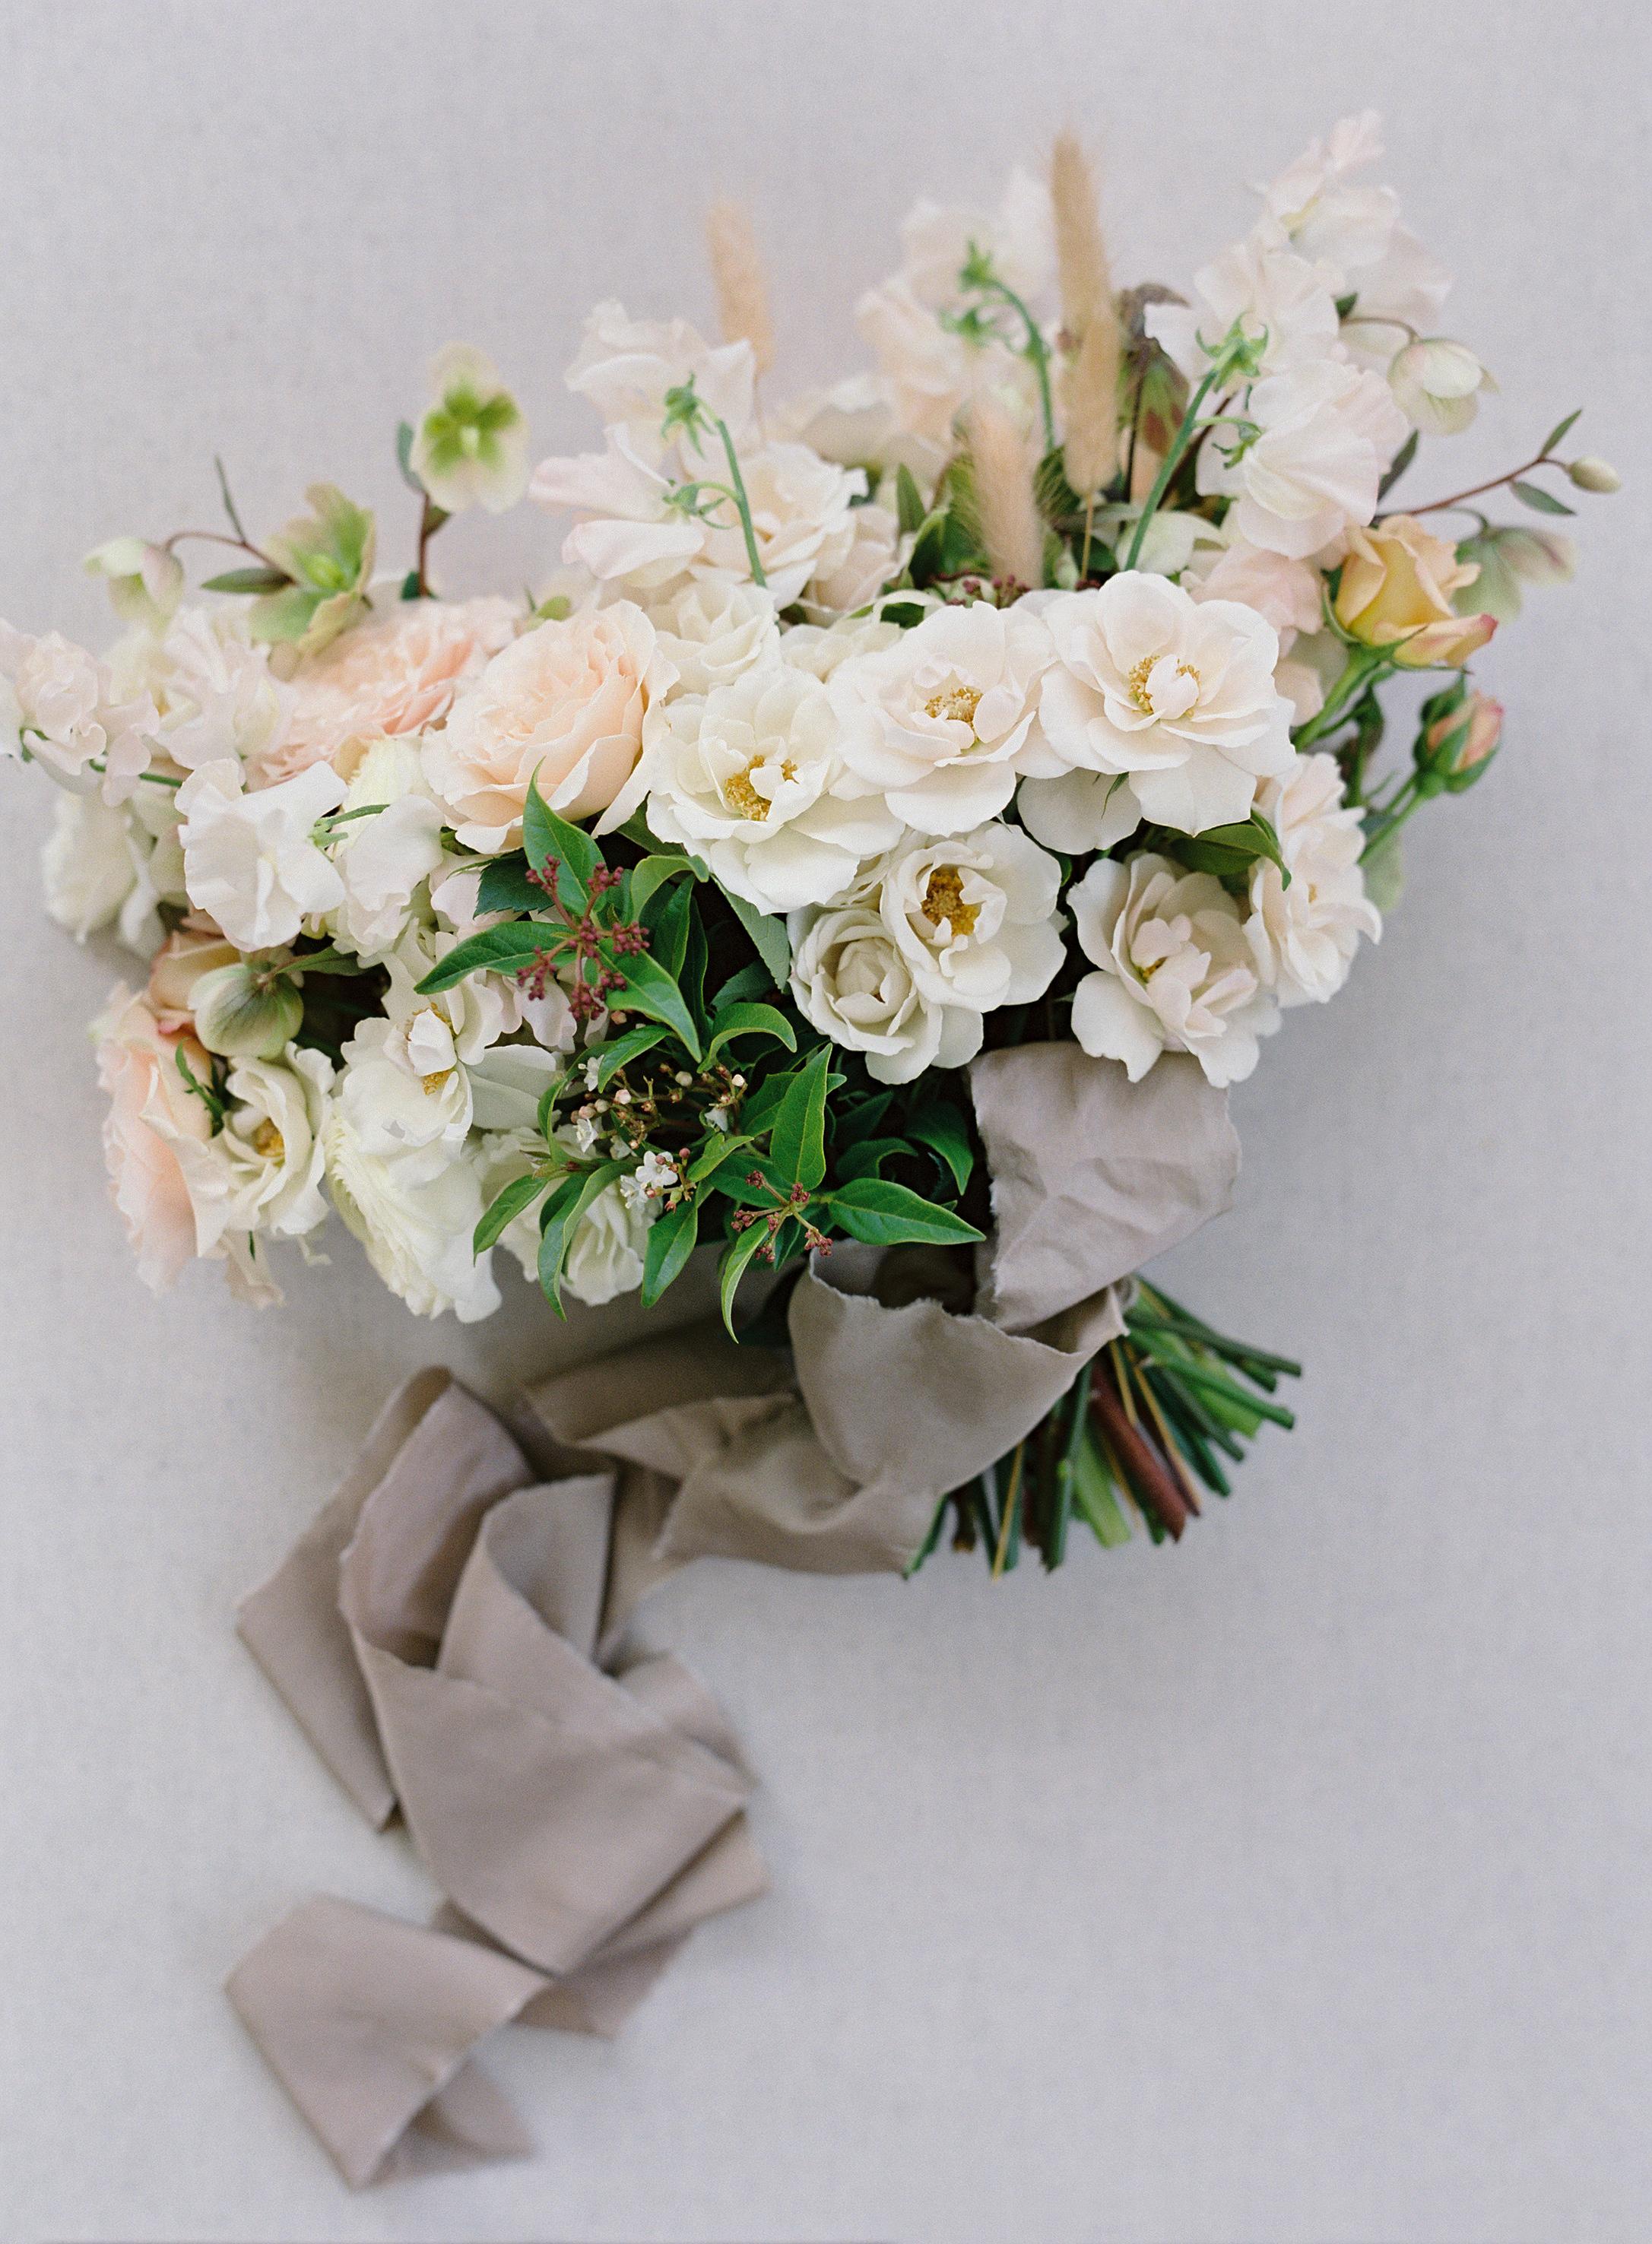 13-Bouquet_by_Ellamah-Photo_by_Christine_Donee.jpg